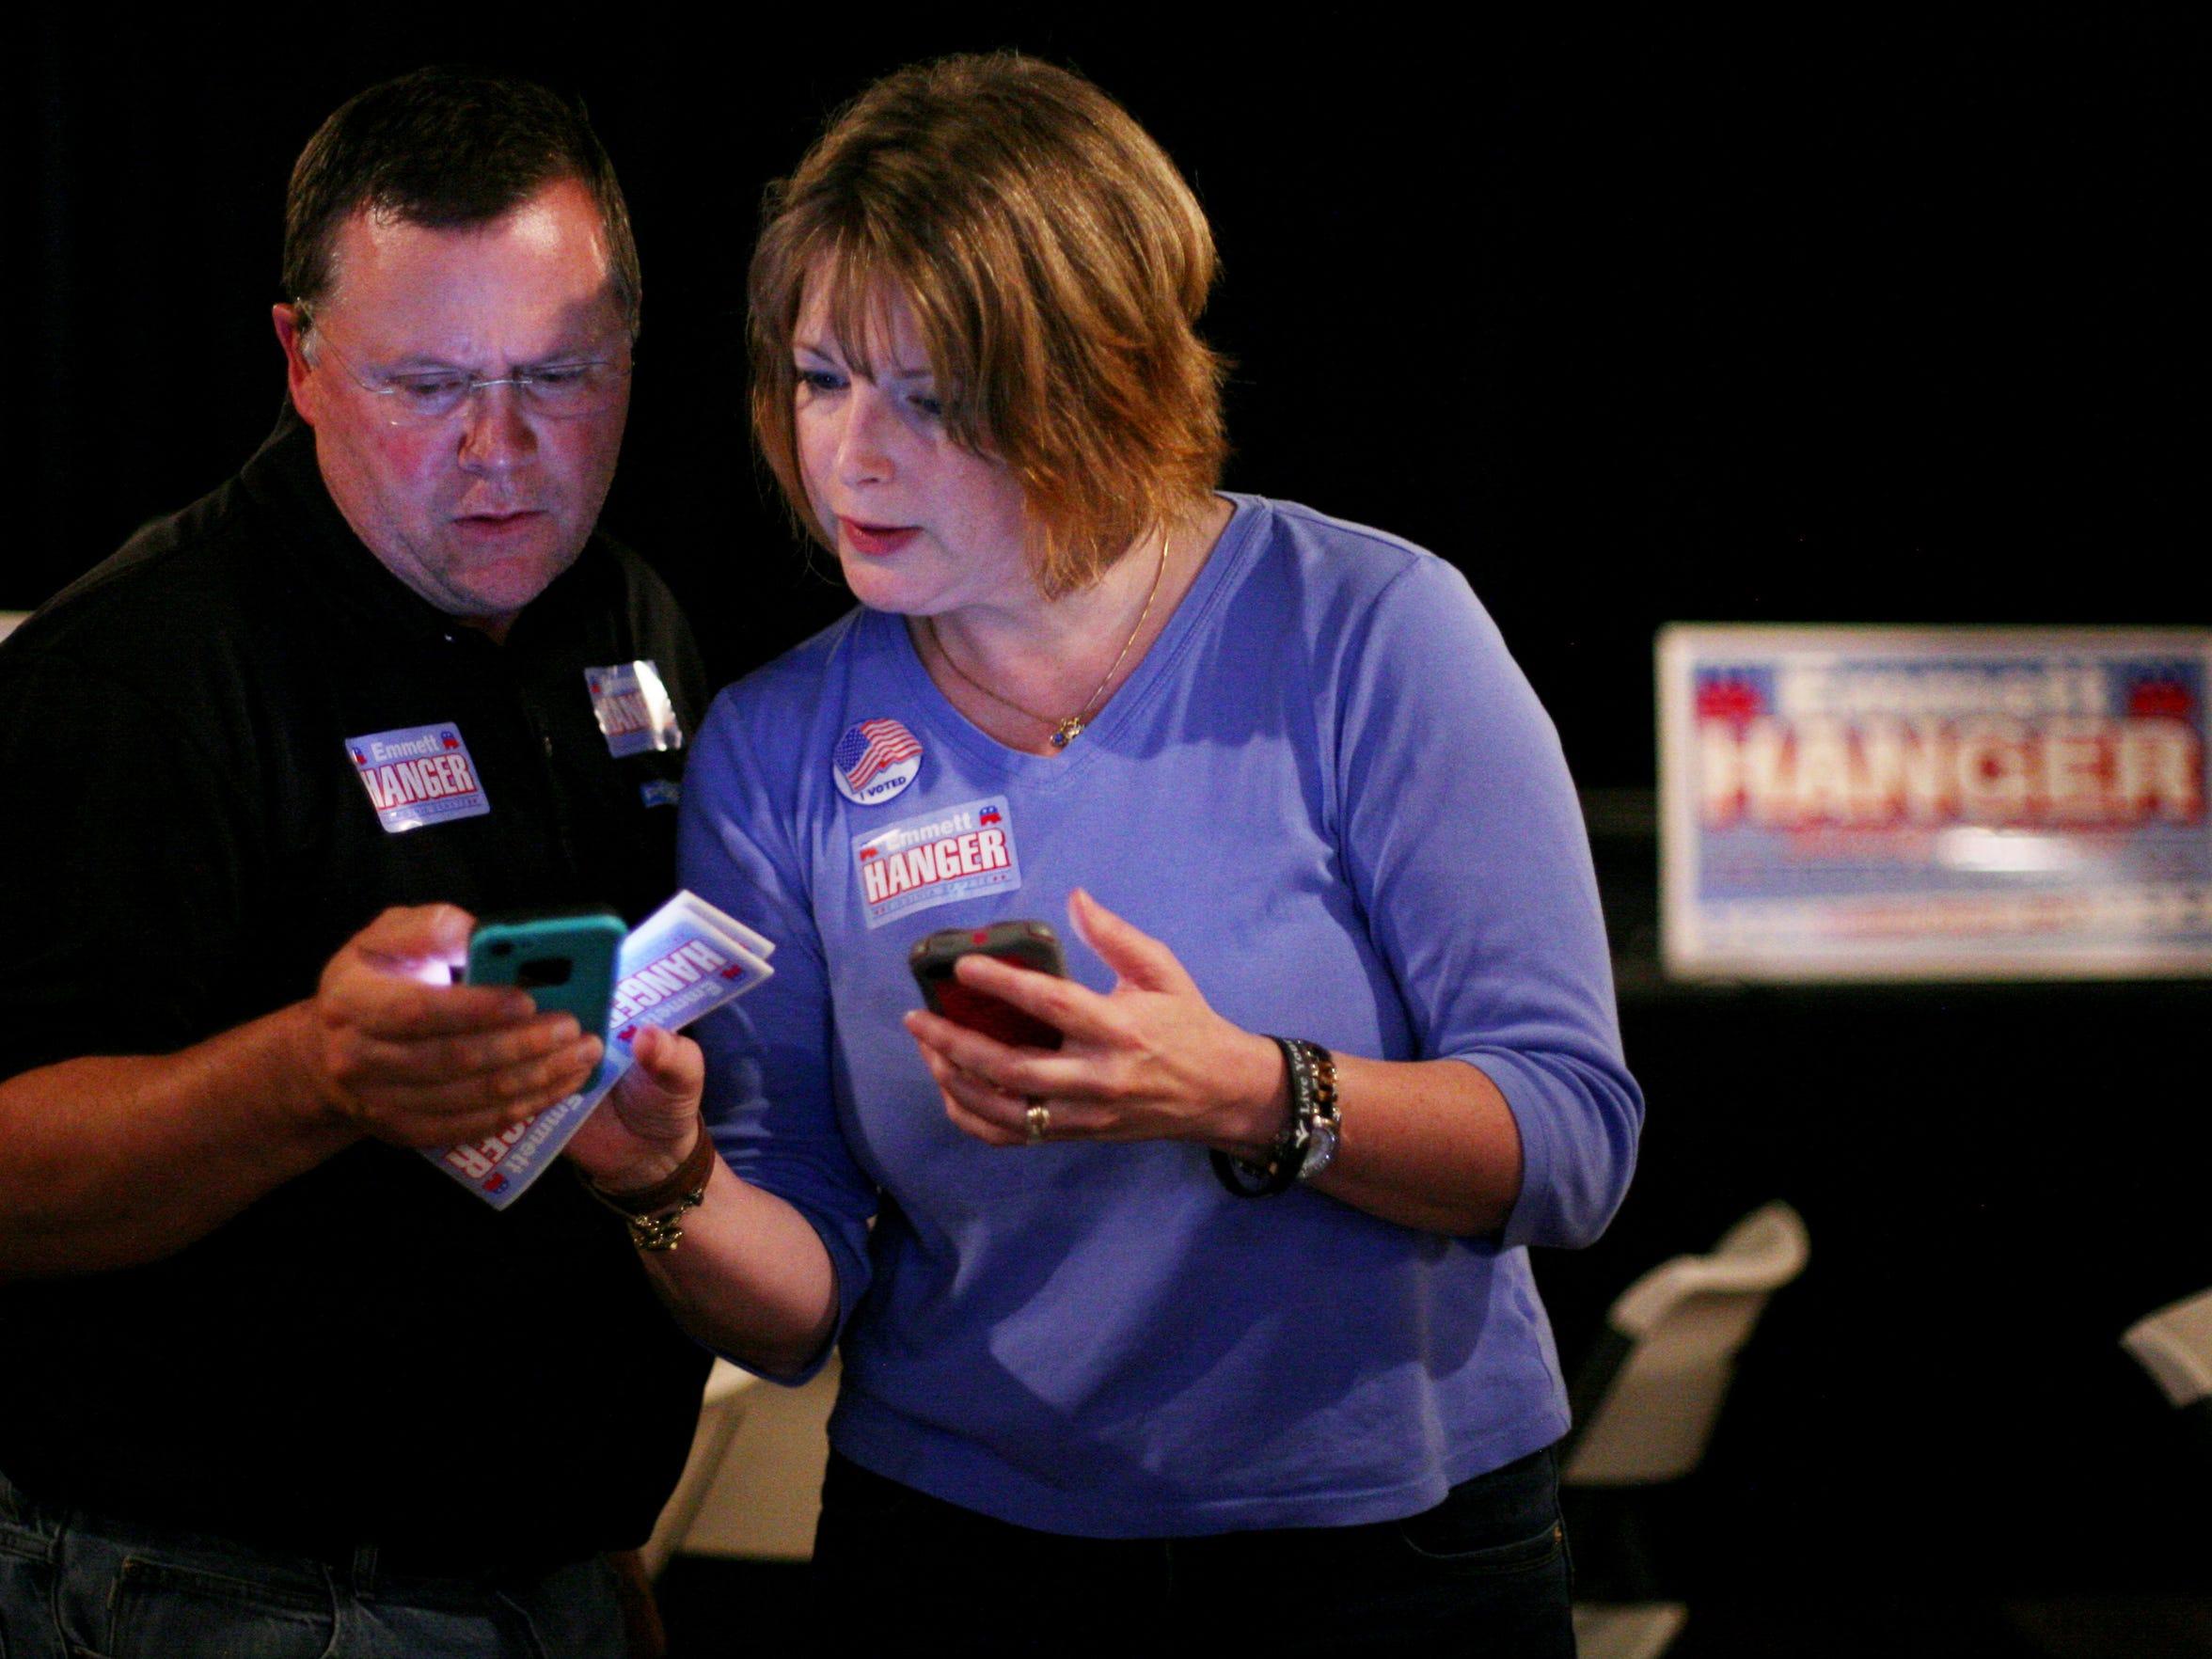 Legislative aide Holly Herman monitors the vote counts